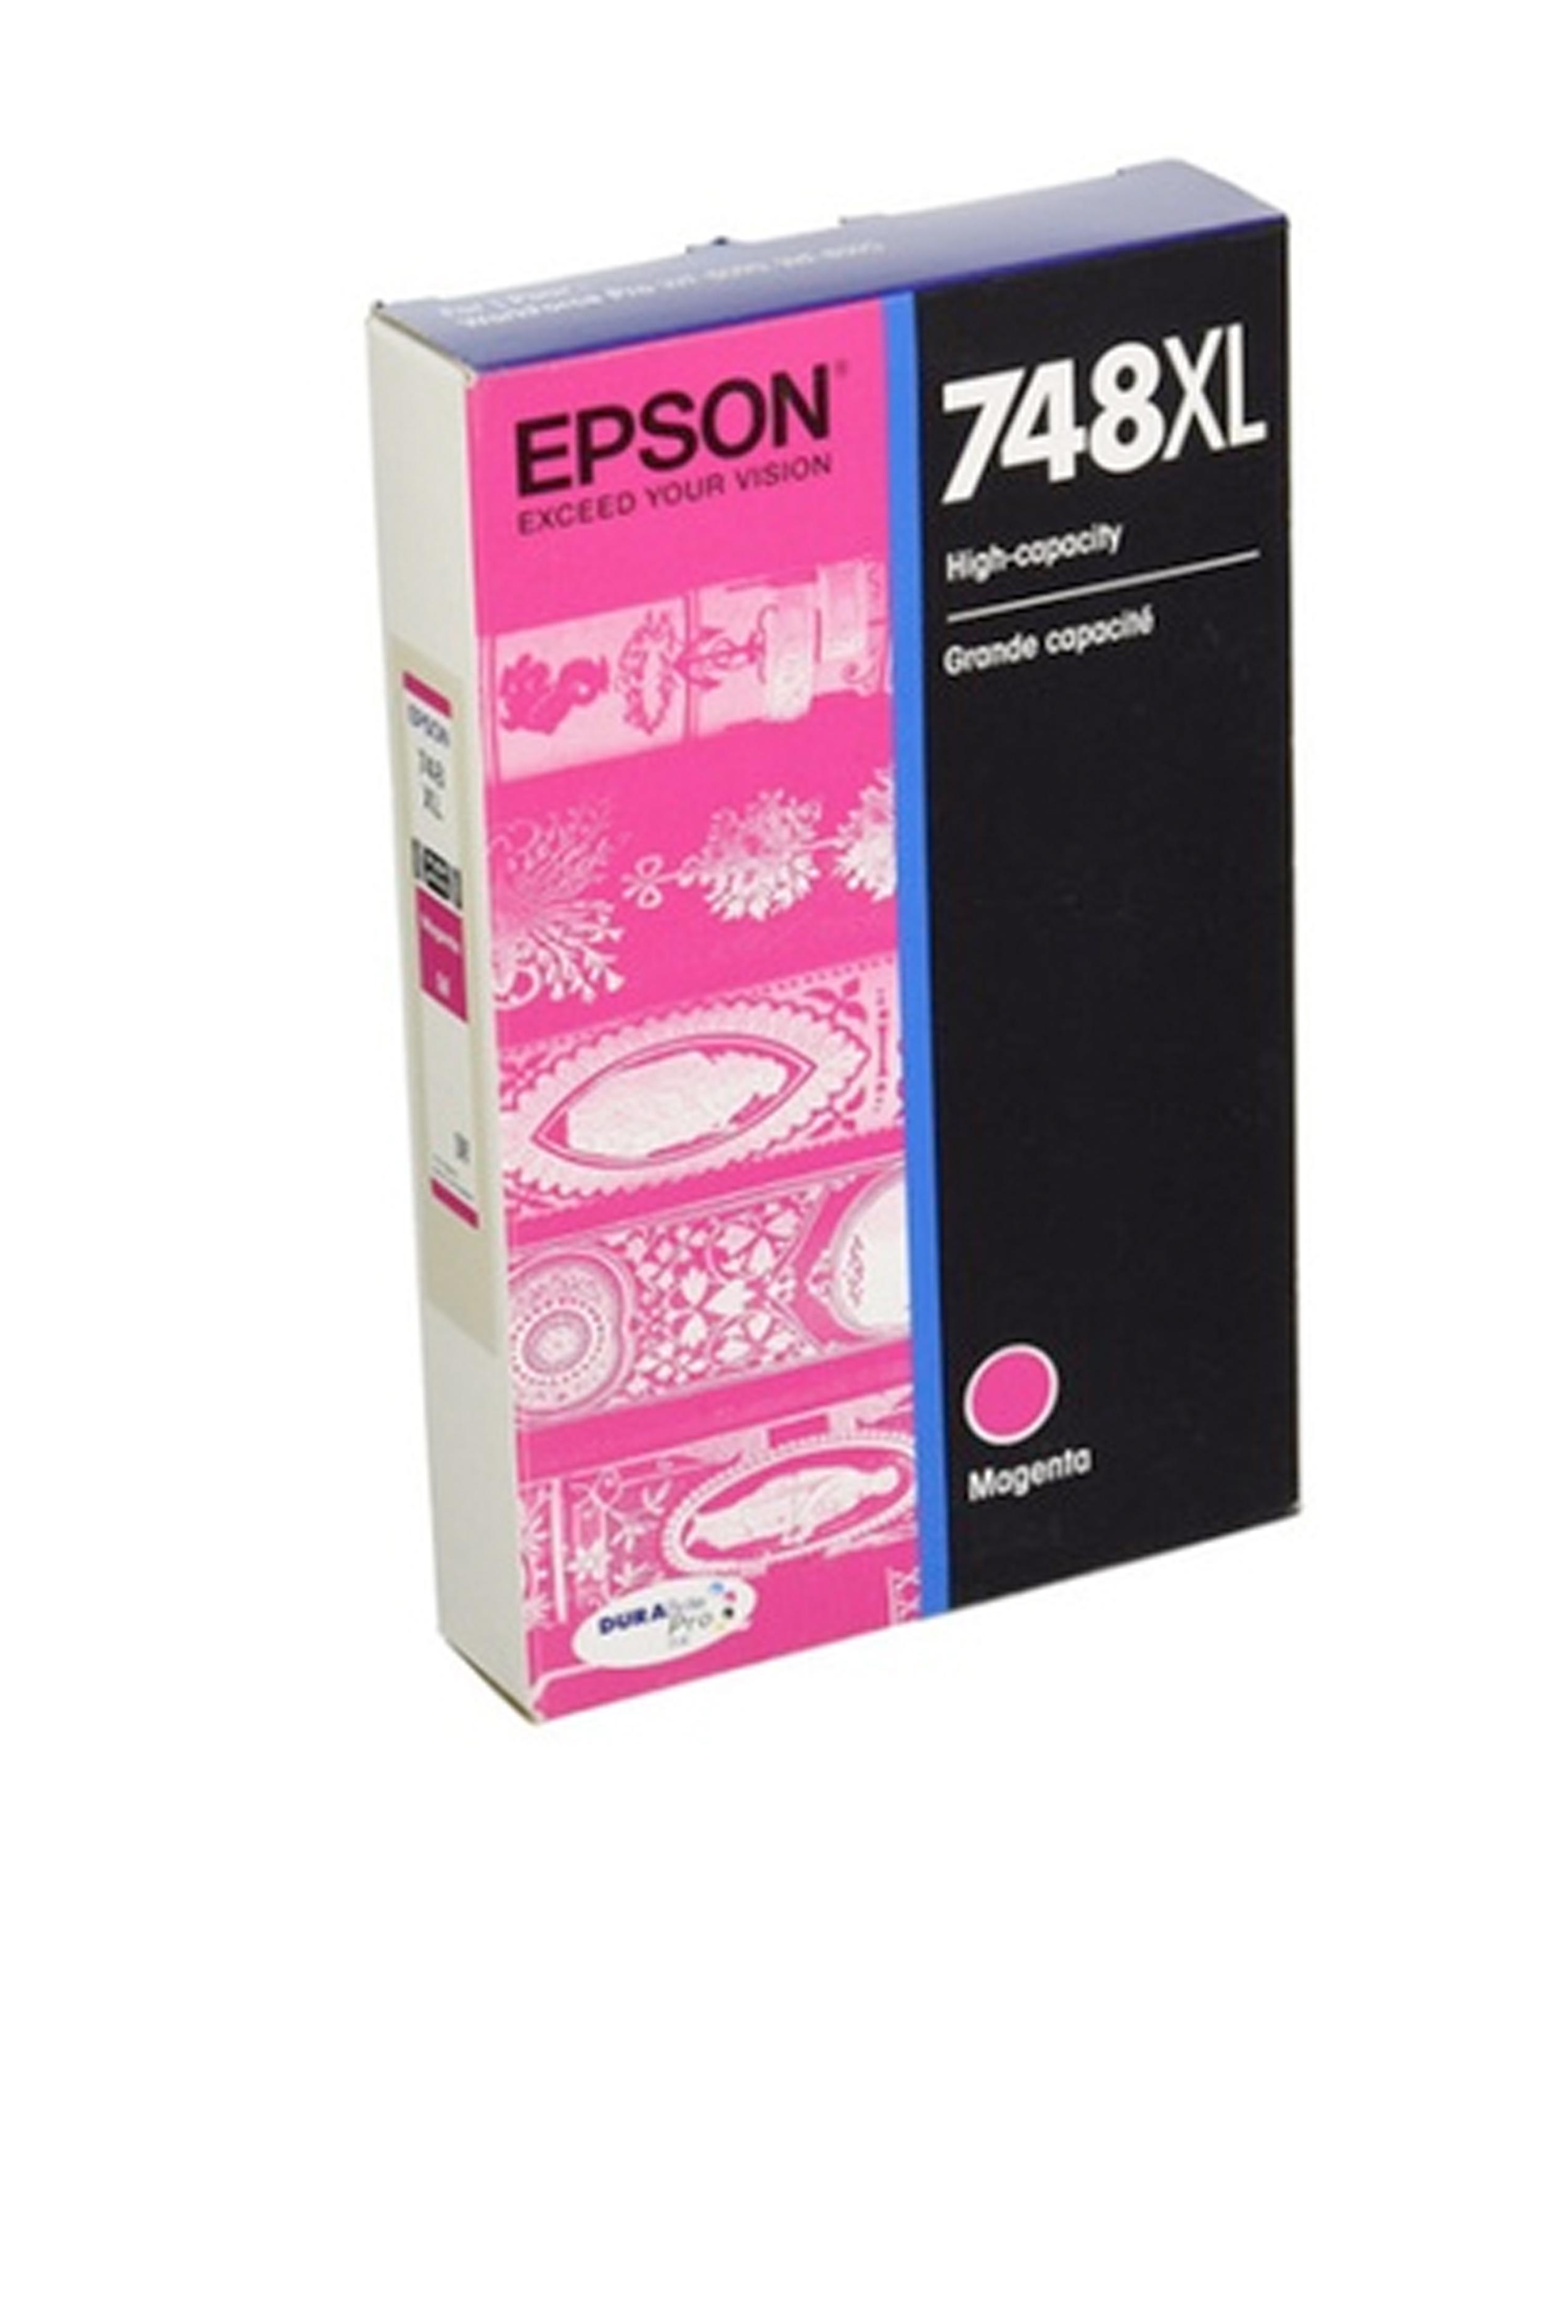 Epson 748, Magenta Ink Cartridge, High Capacity (T748XL320)